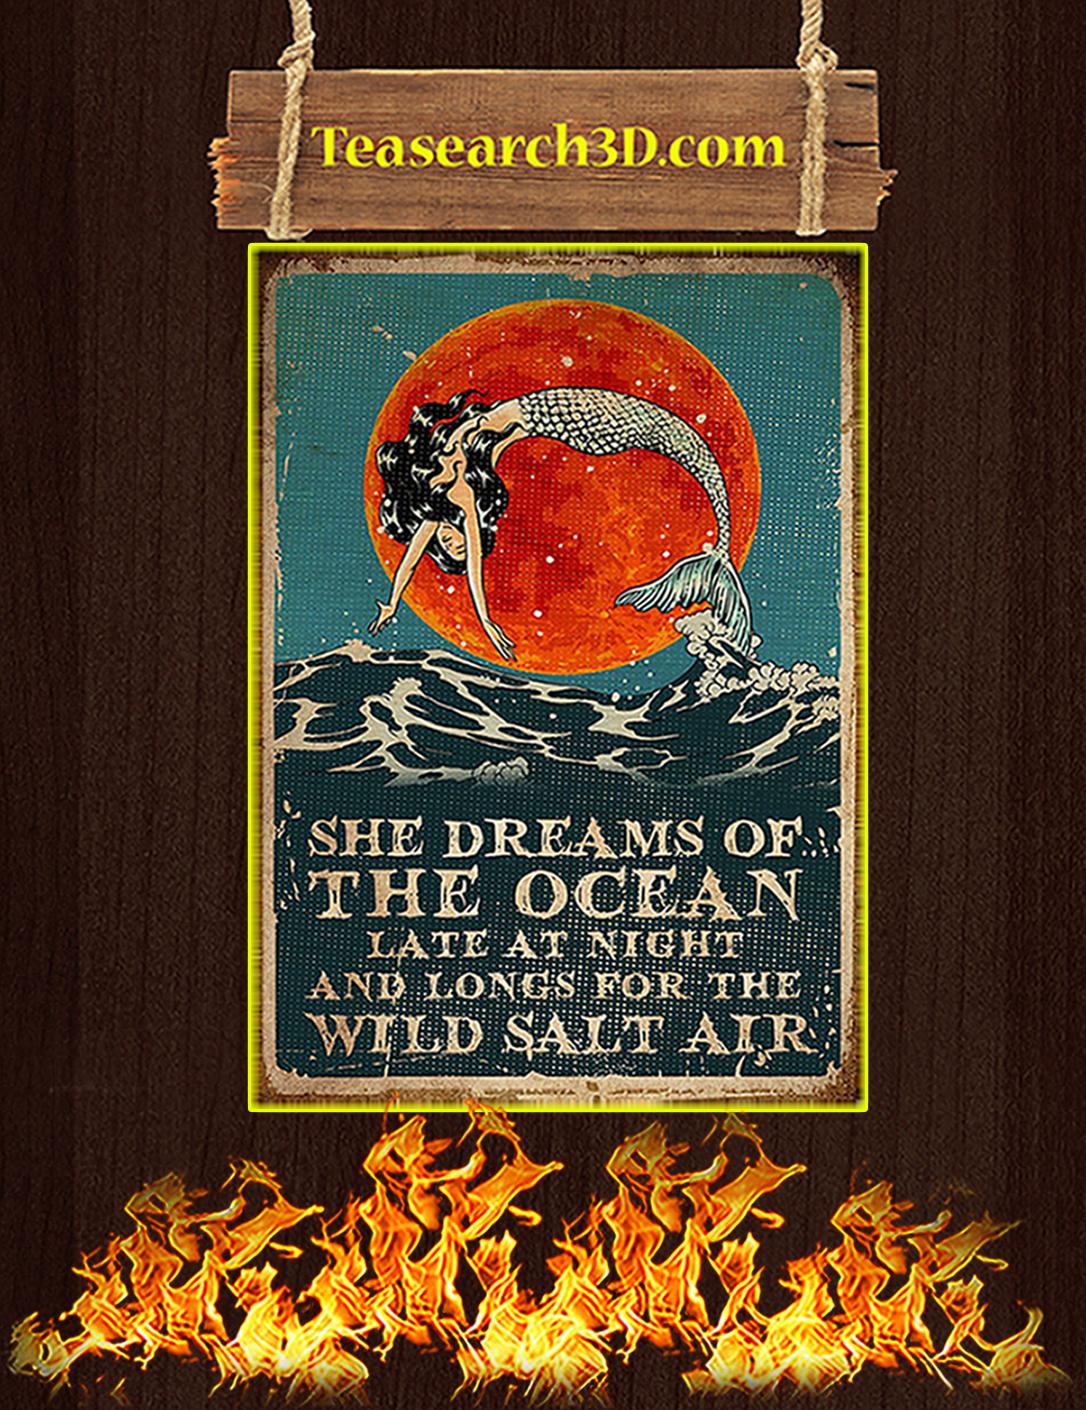 Mermaid she dreams of the ocean poster A2